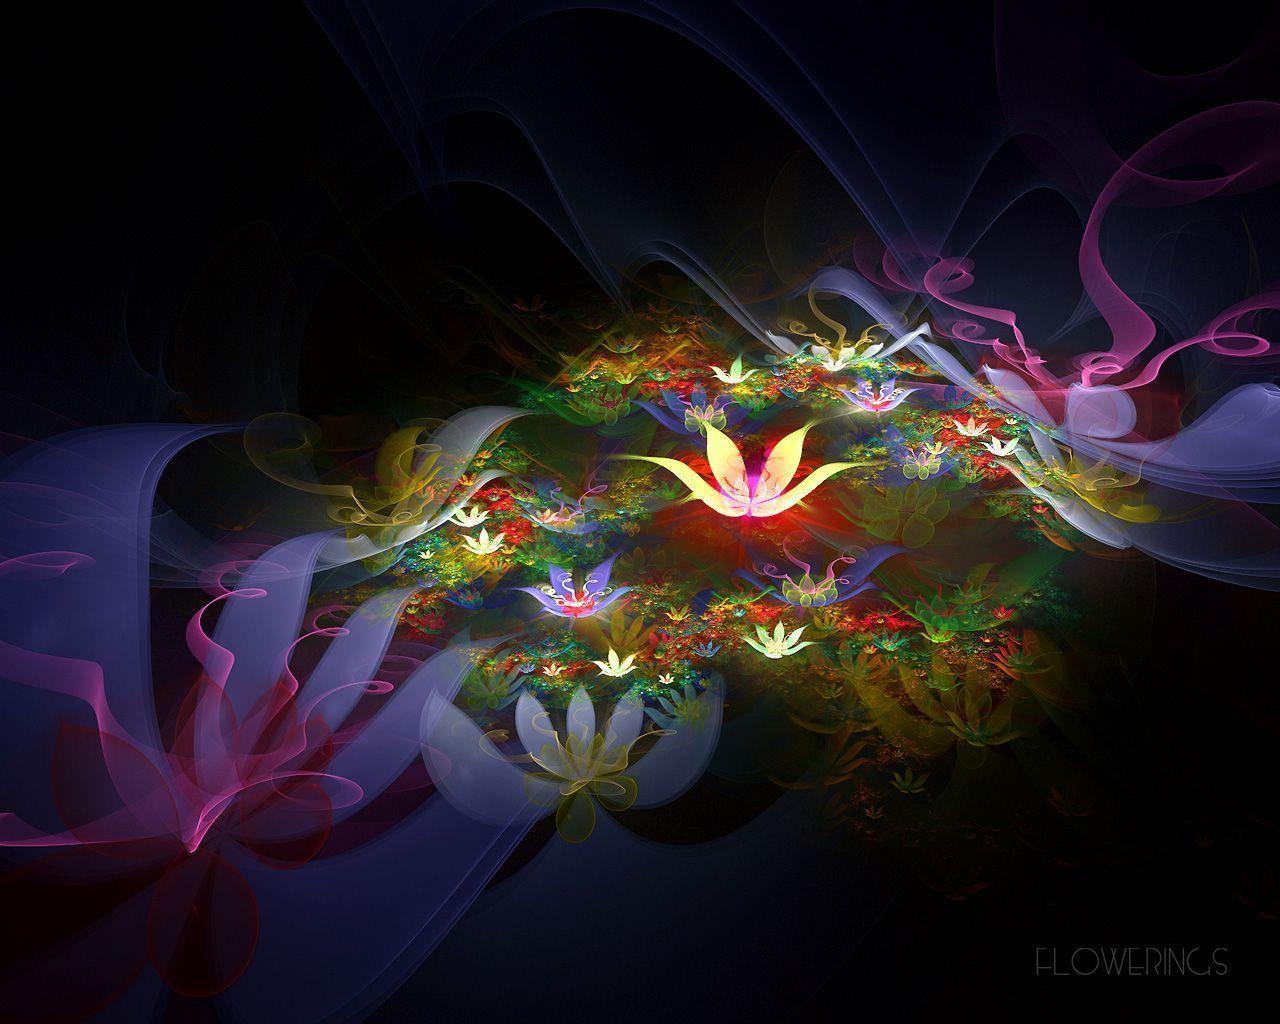 Fantastic lotus flower Wallpapers - HD Wallpapers 1284